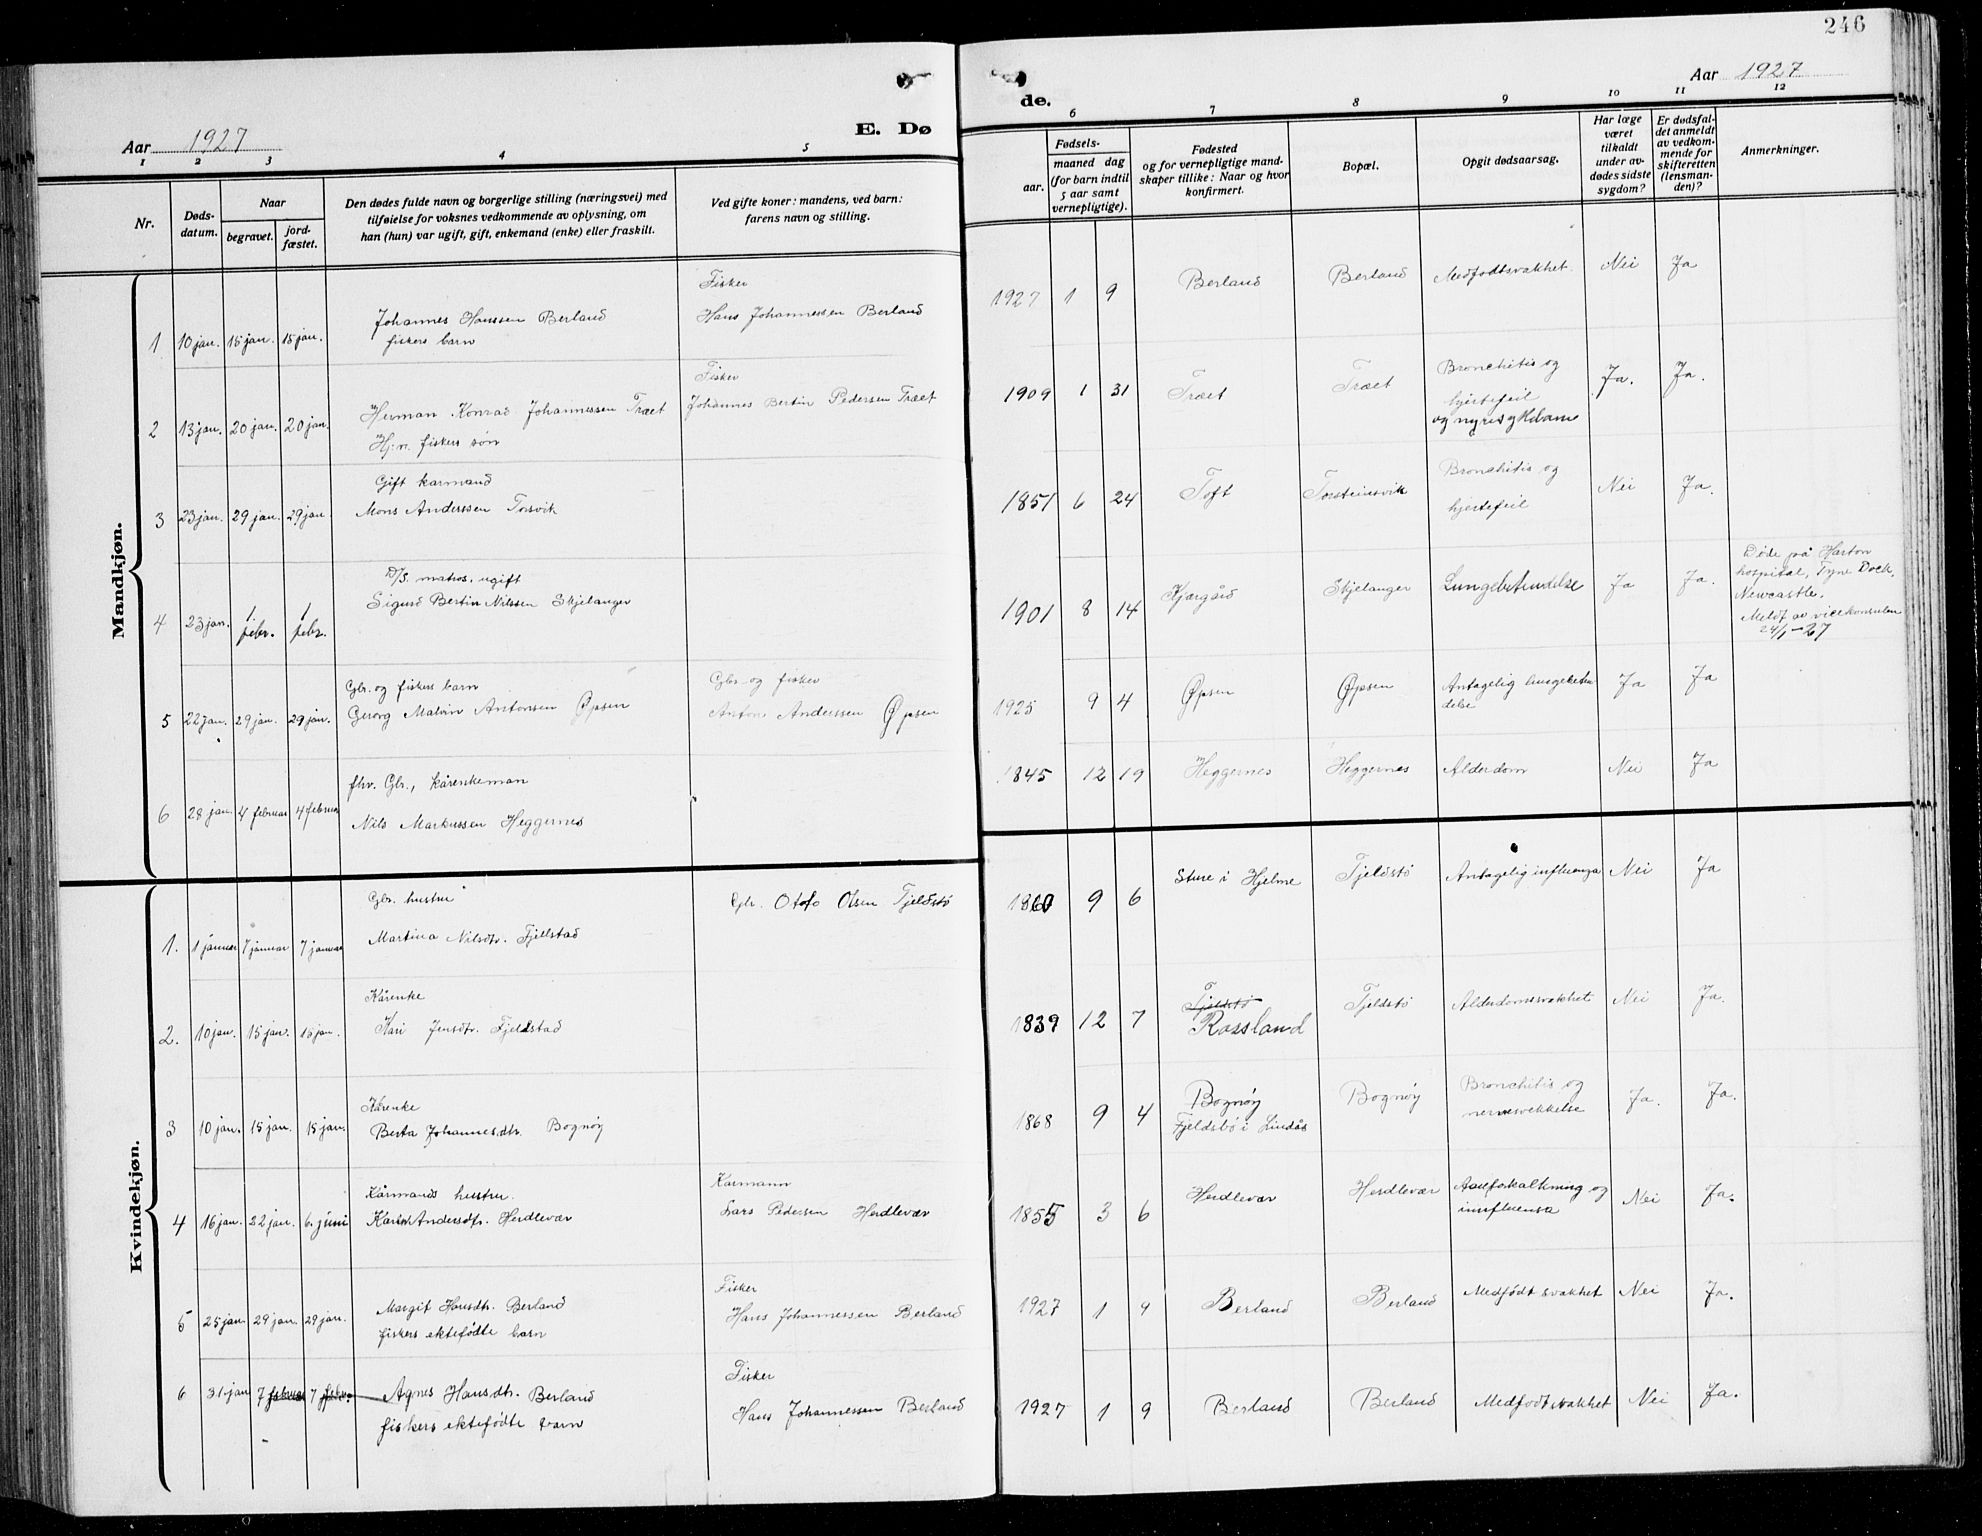 SAB, Herdla Sokneprestembete, H/Hab: Klokkerbok nr. C 3, 1926-1940, s. 246